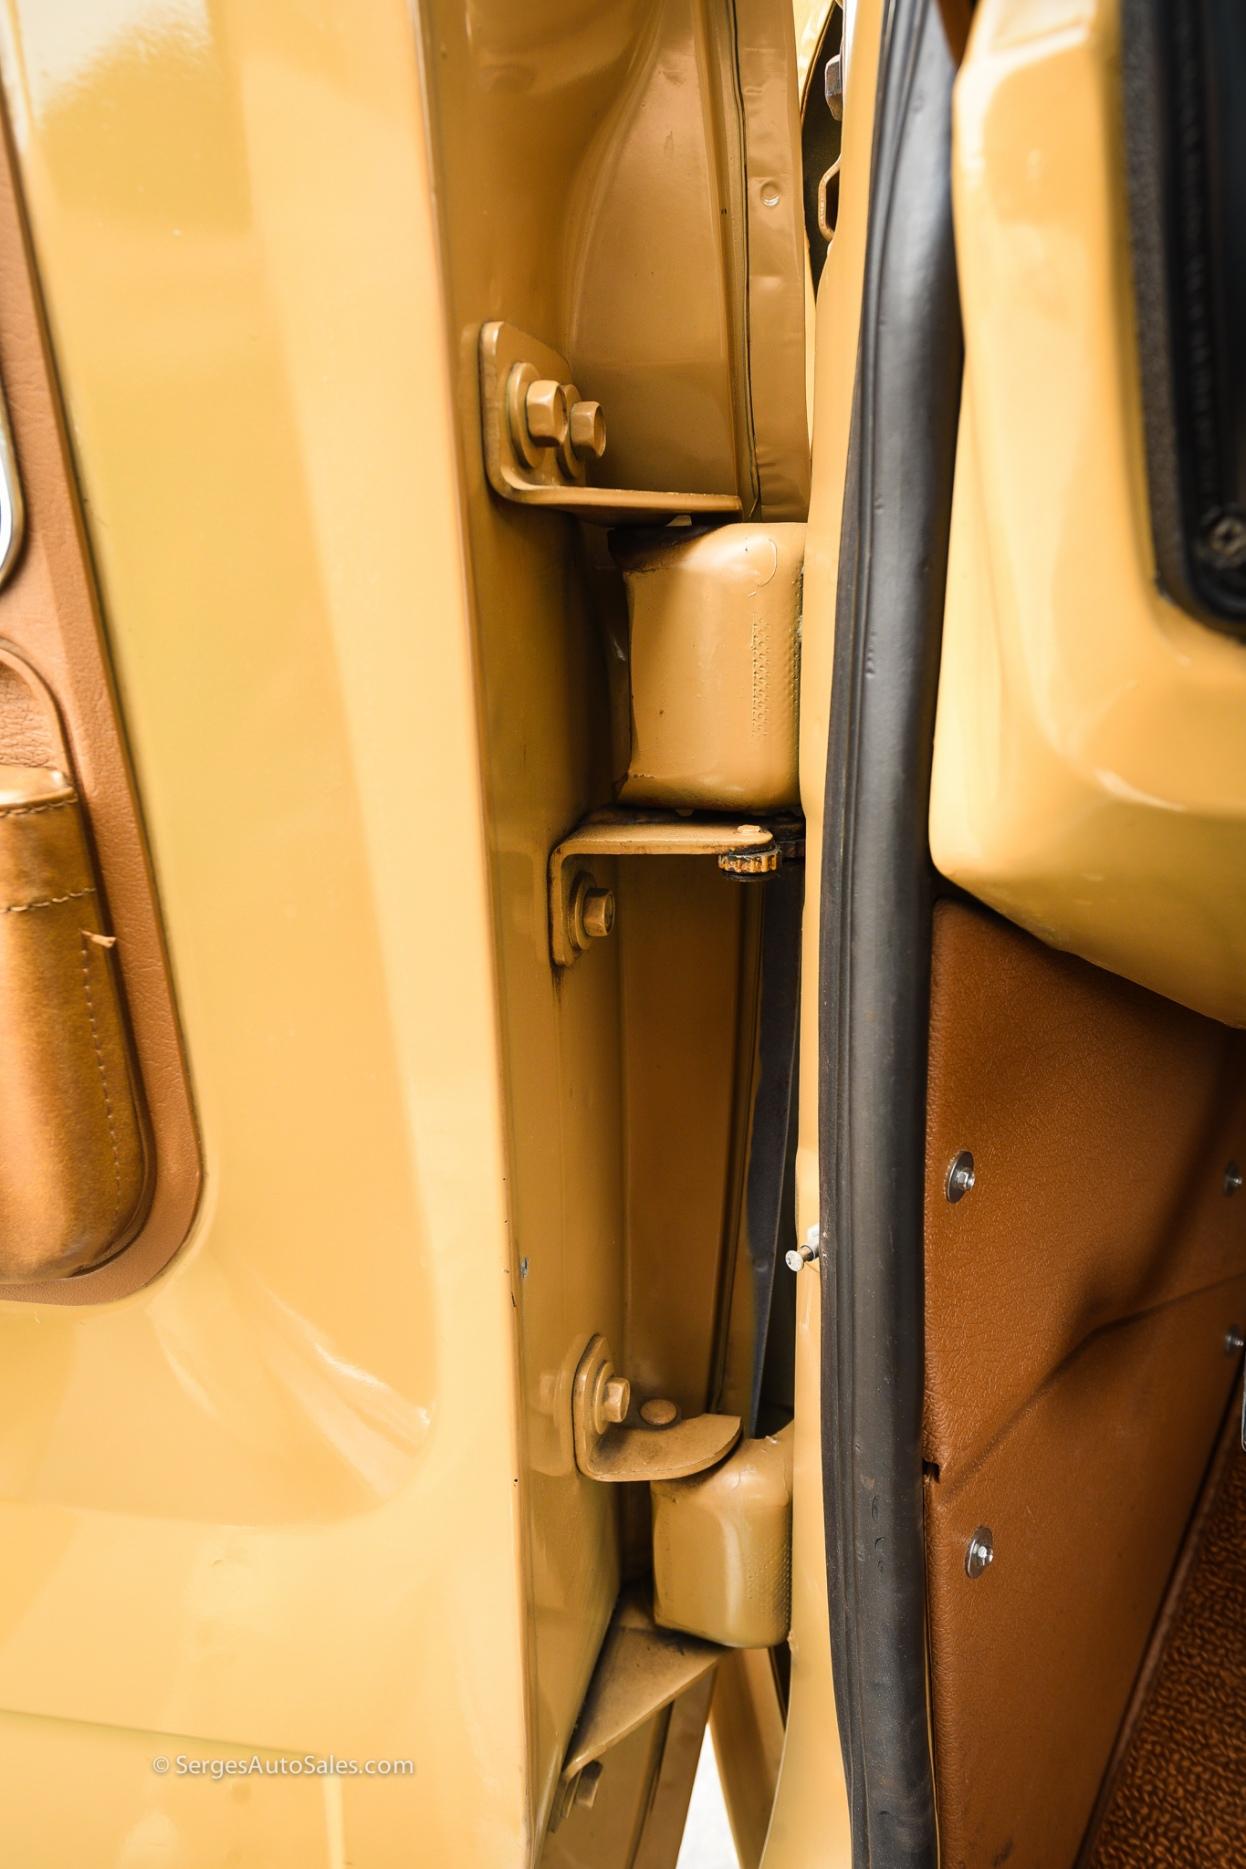 1973-1972-1971-1970-1969-chevrolet-cheyenne-pick-up-for-sale-barrett-mecum-serges-auto-sales-scranton-blakely-pennsylvania-88